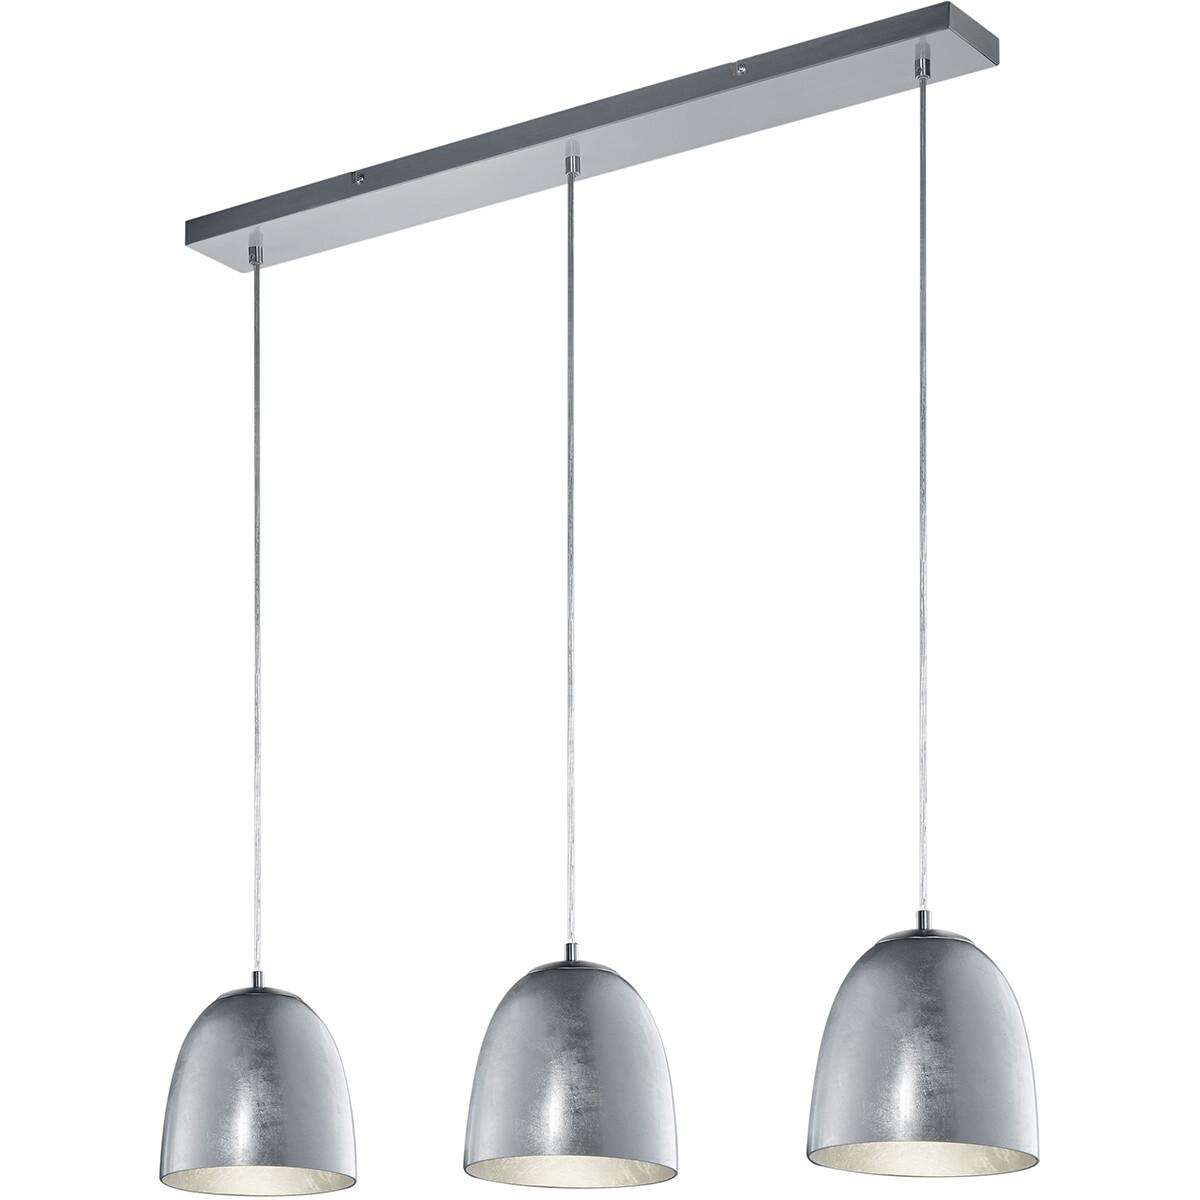 LED Hanglamp - Hangverlichting - Trion Onutia - E14 Fitting - 3-lichts - Rechthoek - Mat Zilver - Al